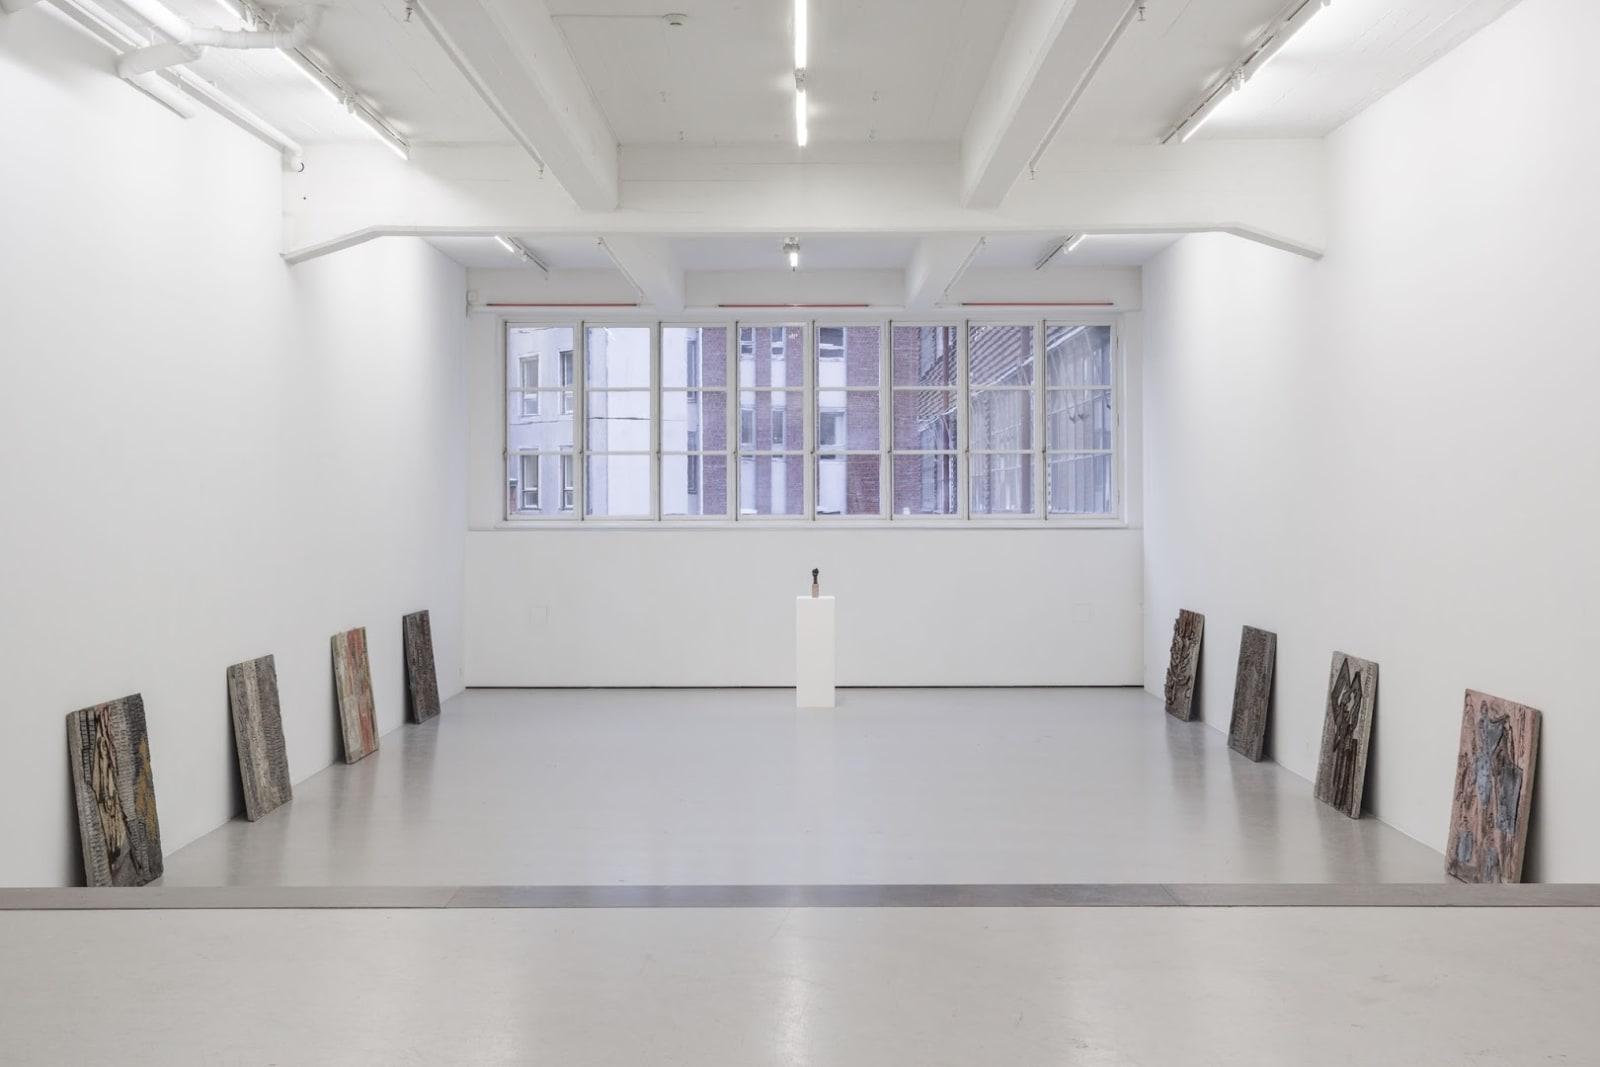 Siri Derkert Installation view Andréhn-Schiptjenko, Stockholm, Sweden, 2014